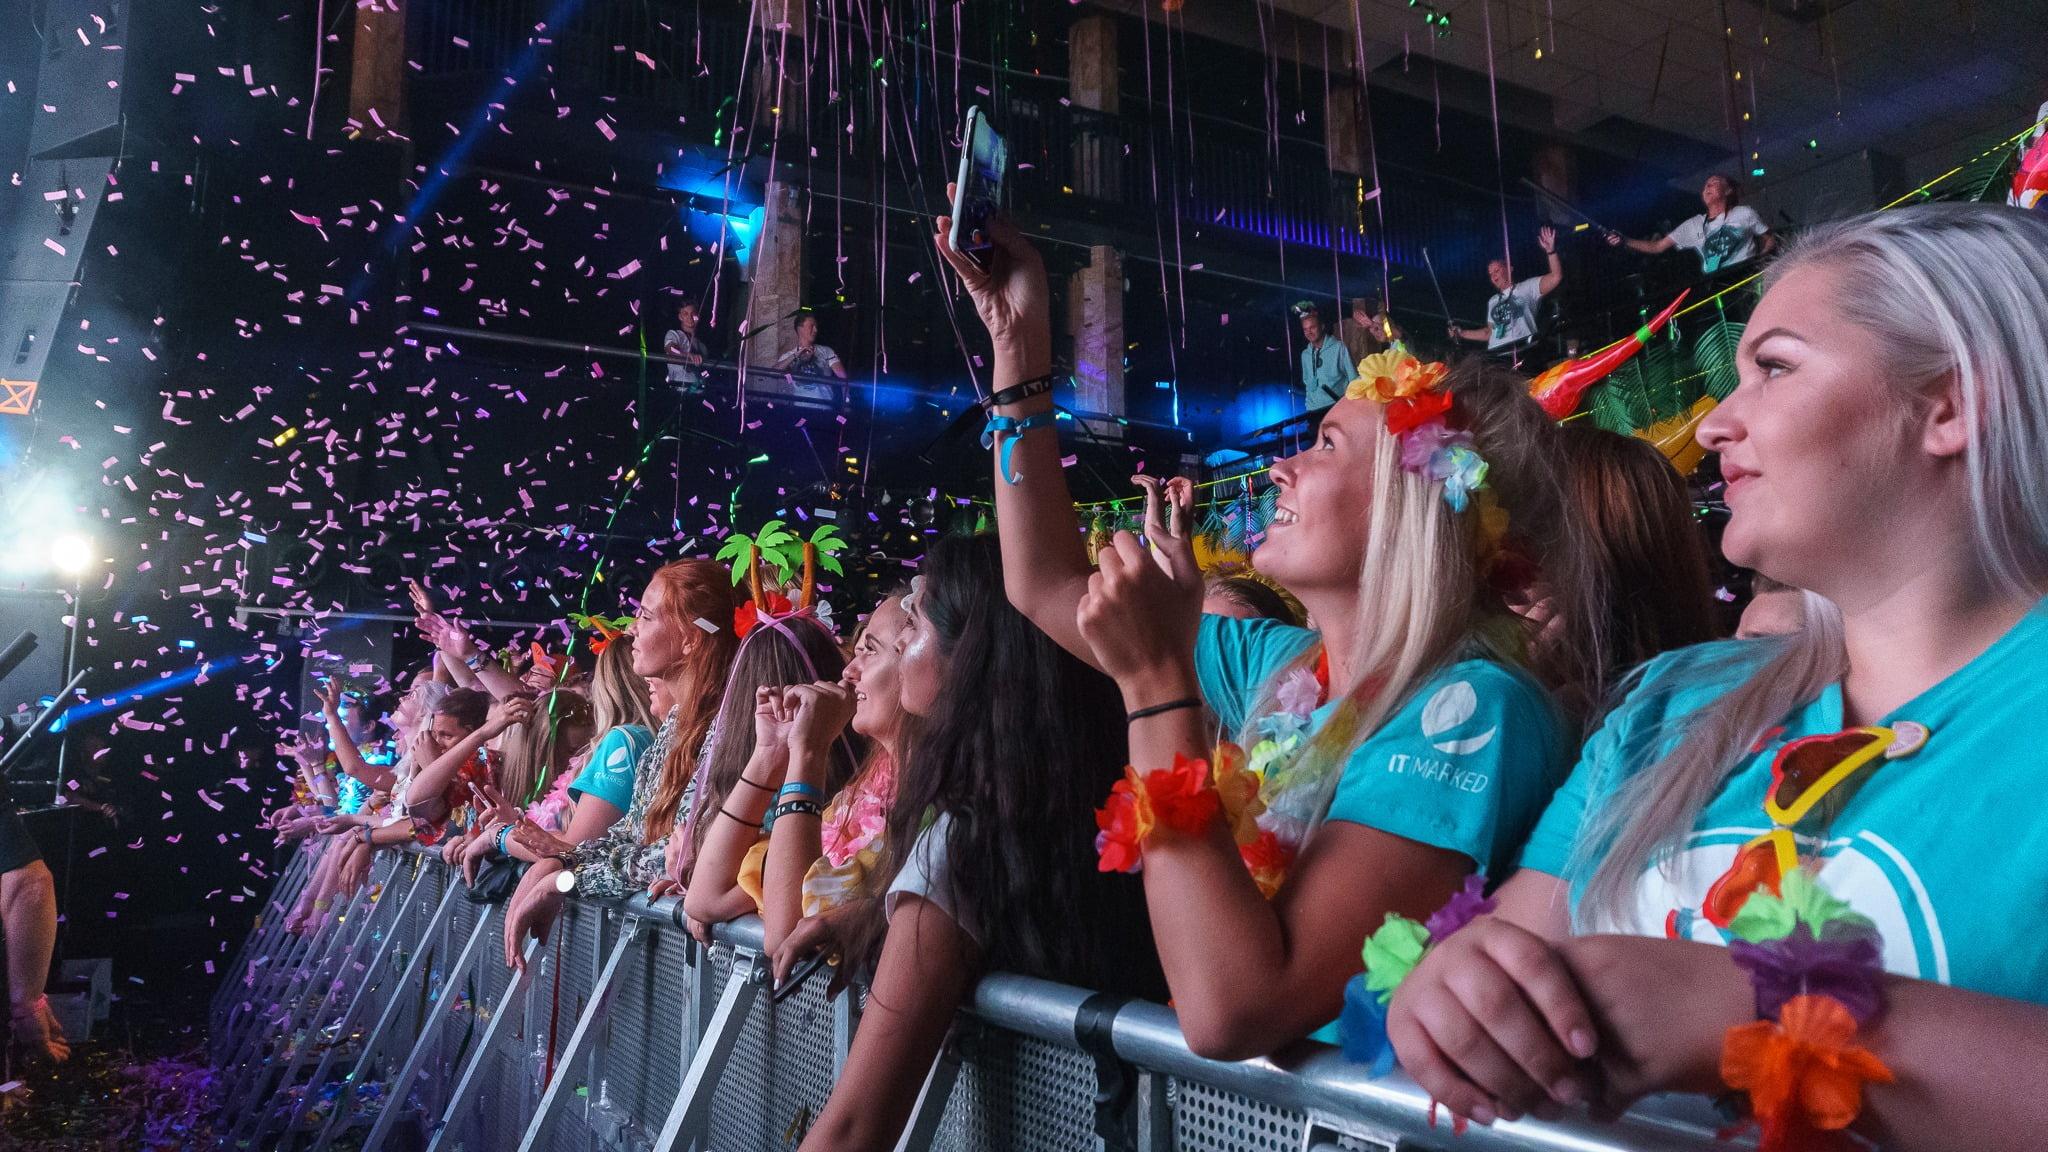 Public event, Party, Audience, Fan, Celebrating, Crowd, Entertainment, Product, People